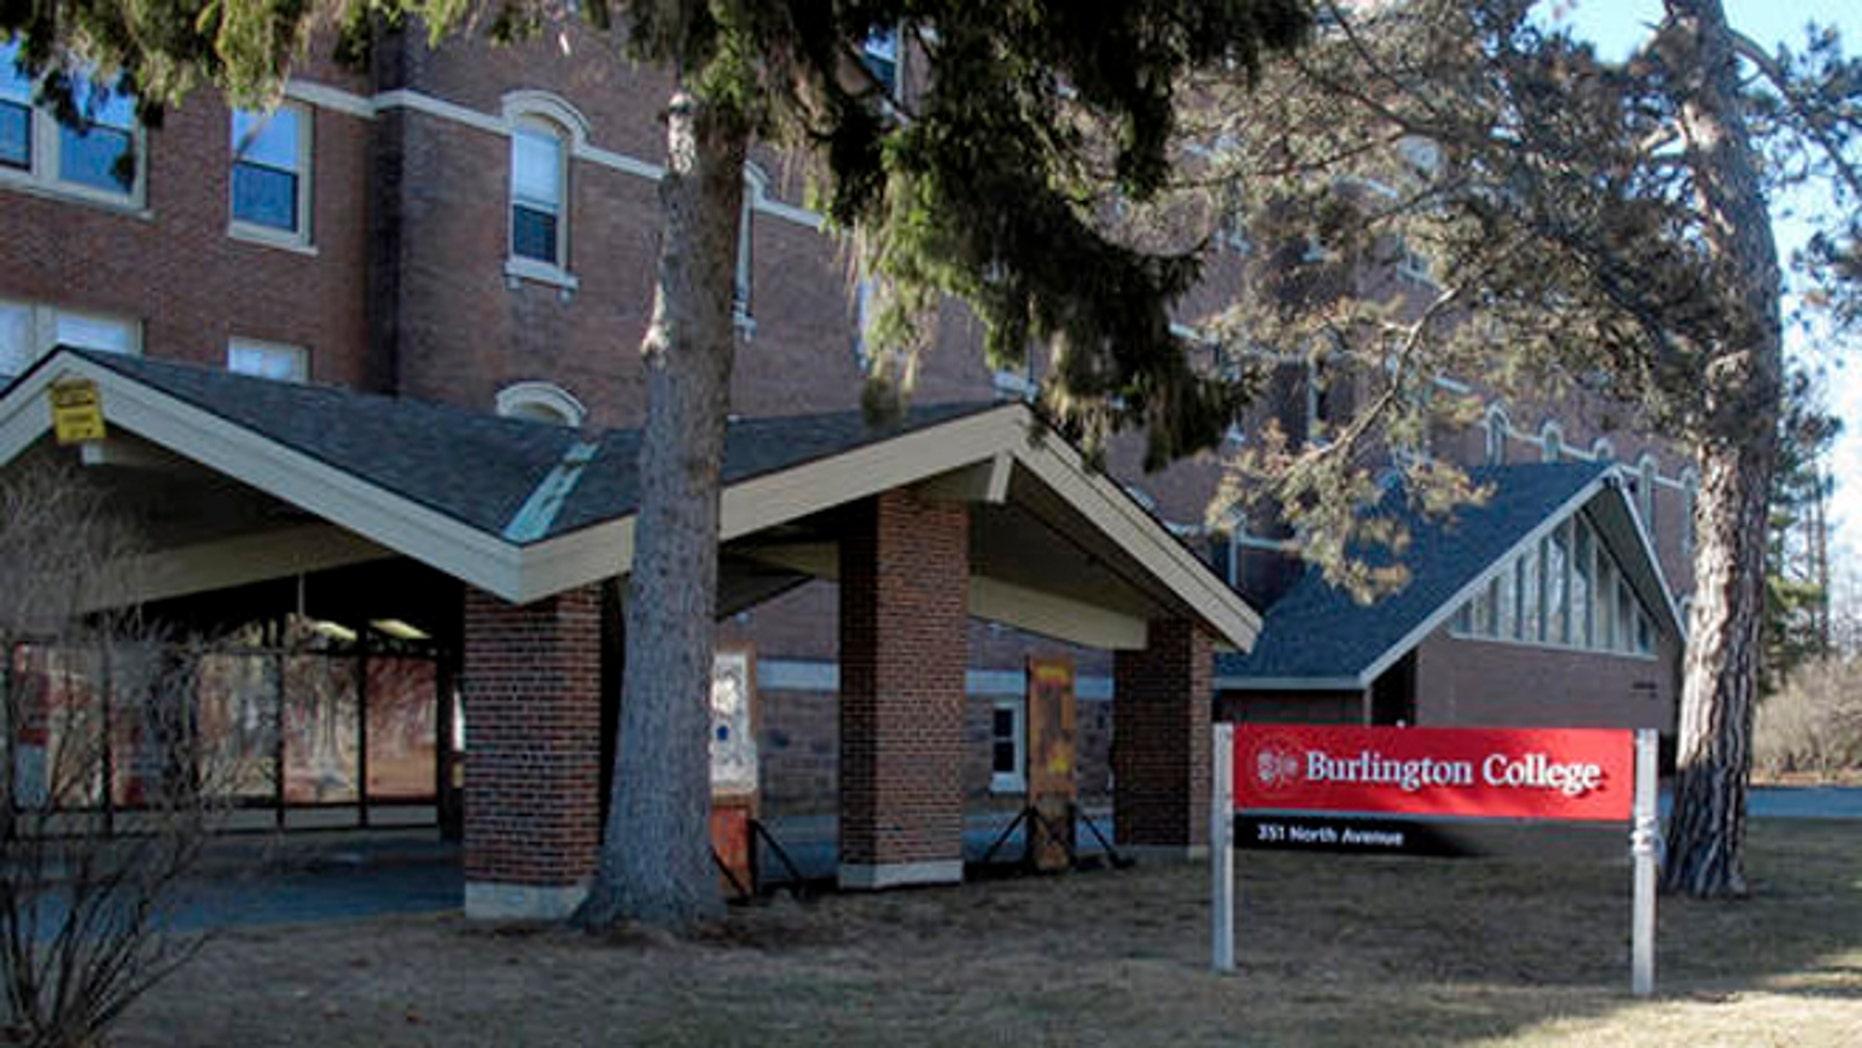 This Feb. 22, 2015 photo shows a building on the campus of Burlington College in Burlington, Vt.